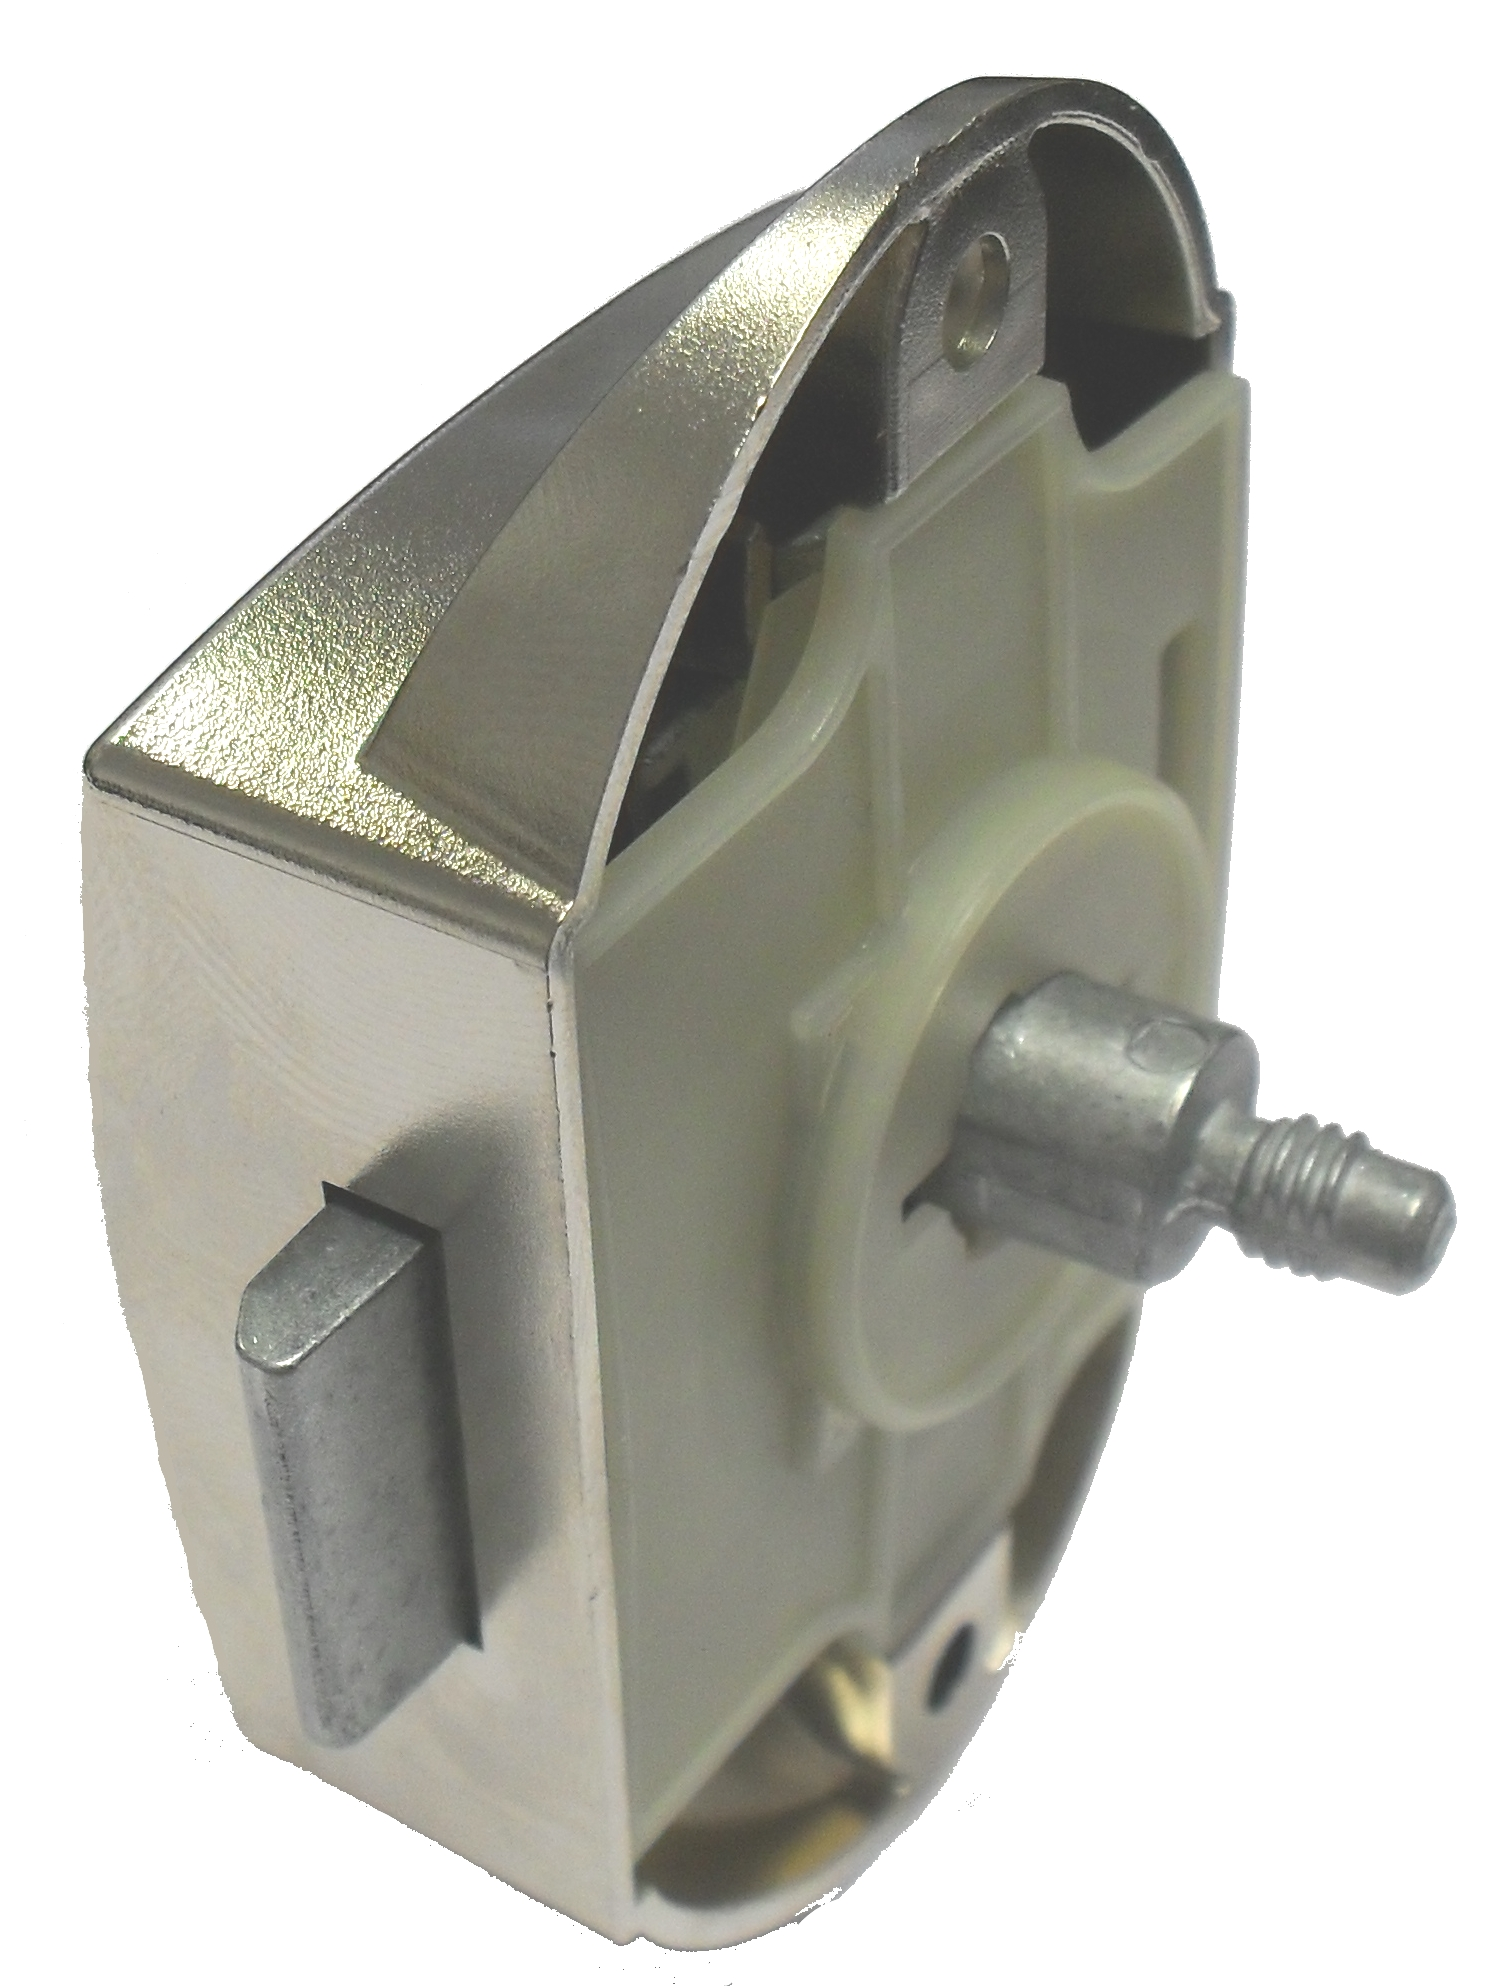 Push Button Espagnolette Lock Espagnolette Locks